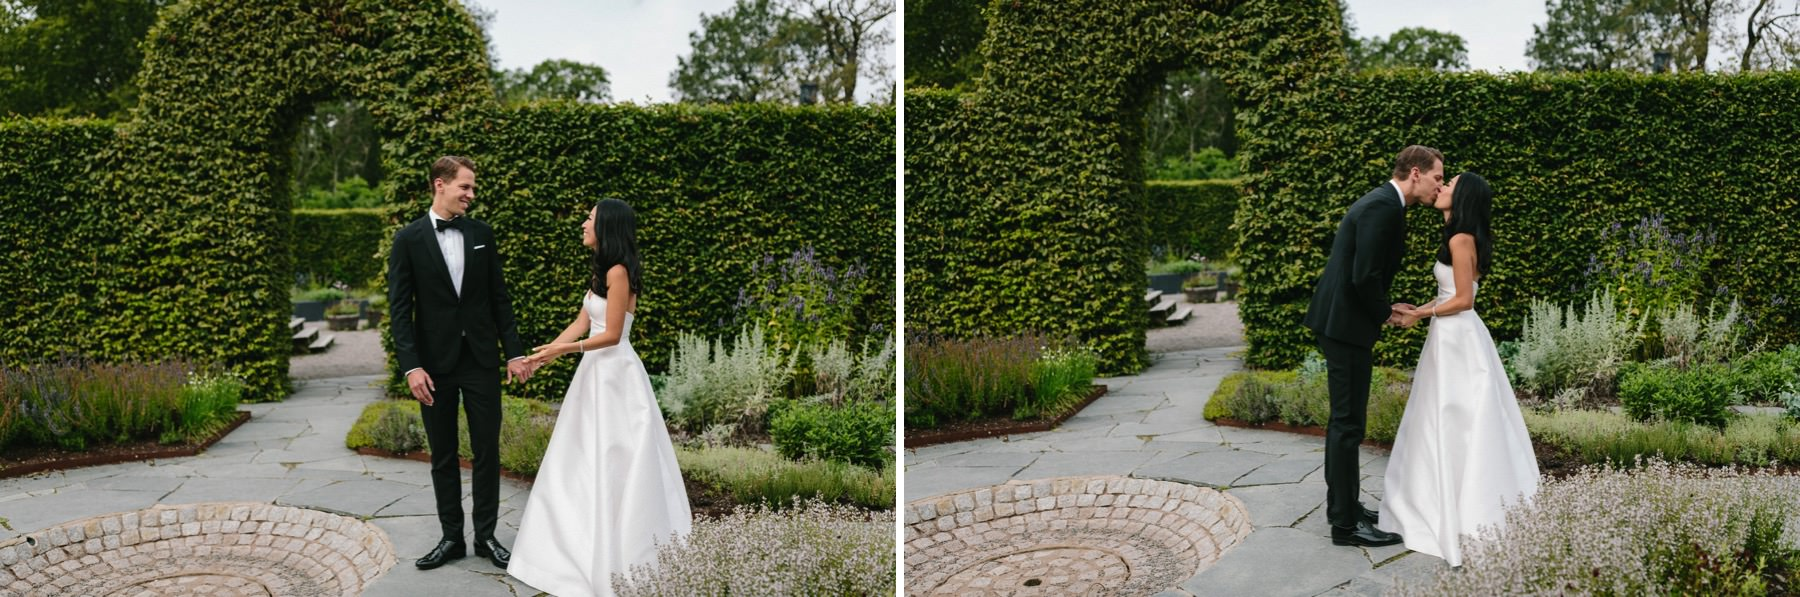 Stockholm international wedding